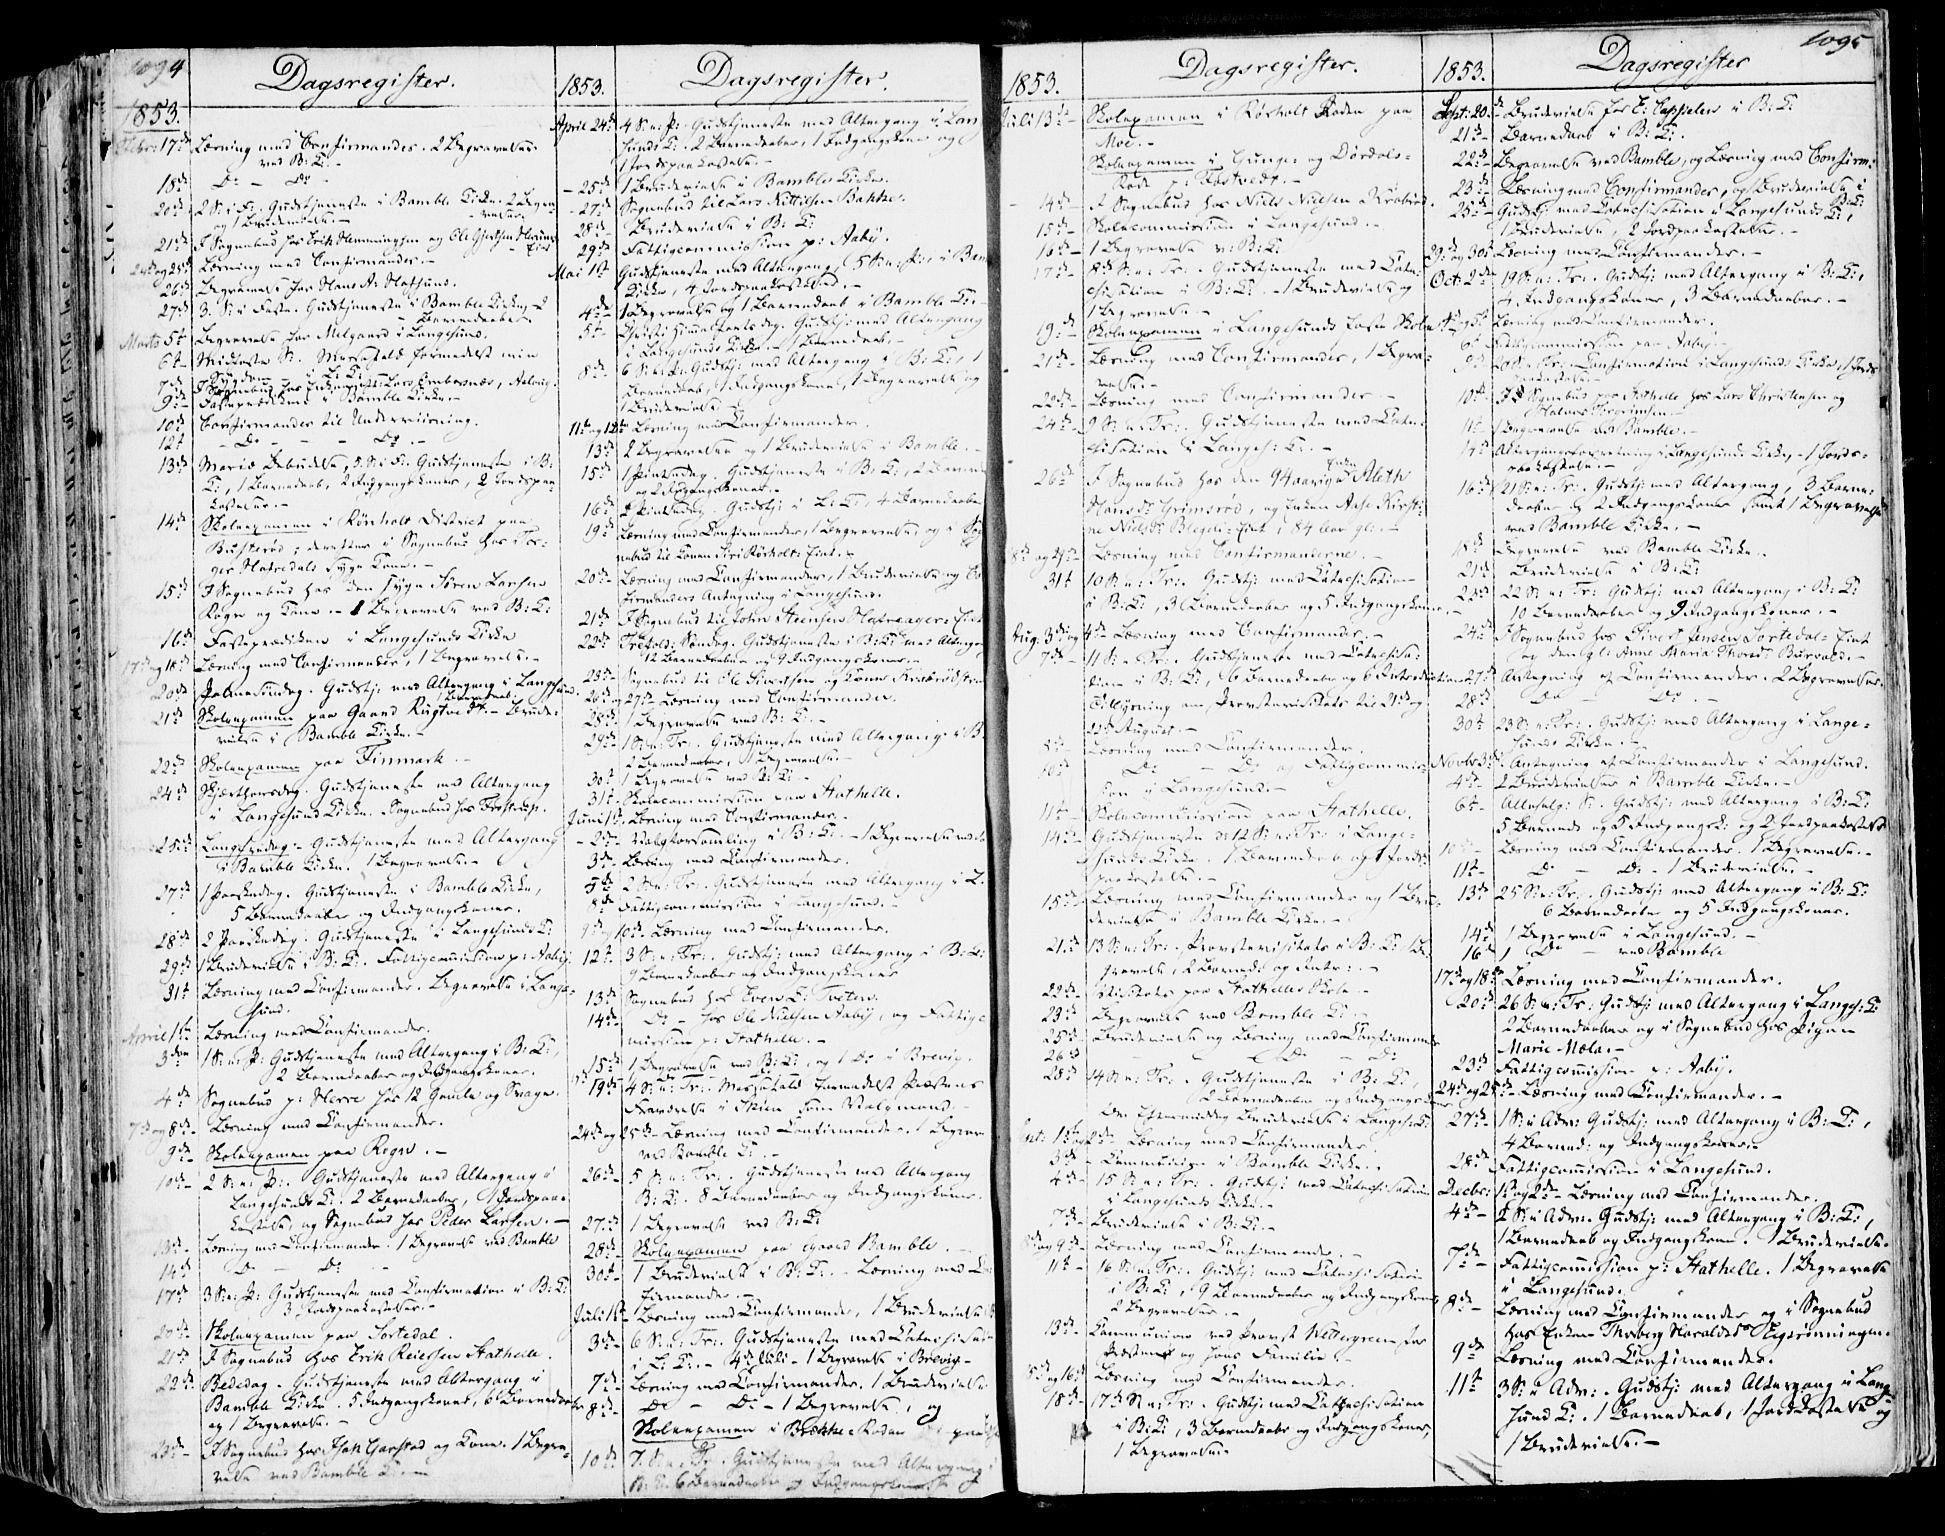 SAKO, Bamble kirkebøker, F/Fa/L0004: Ministerialbok nr. I 4, 1834-1853, s. 1094-1095